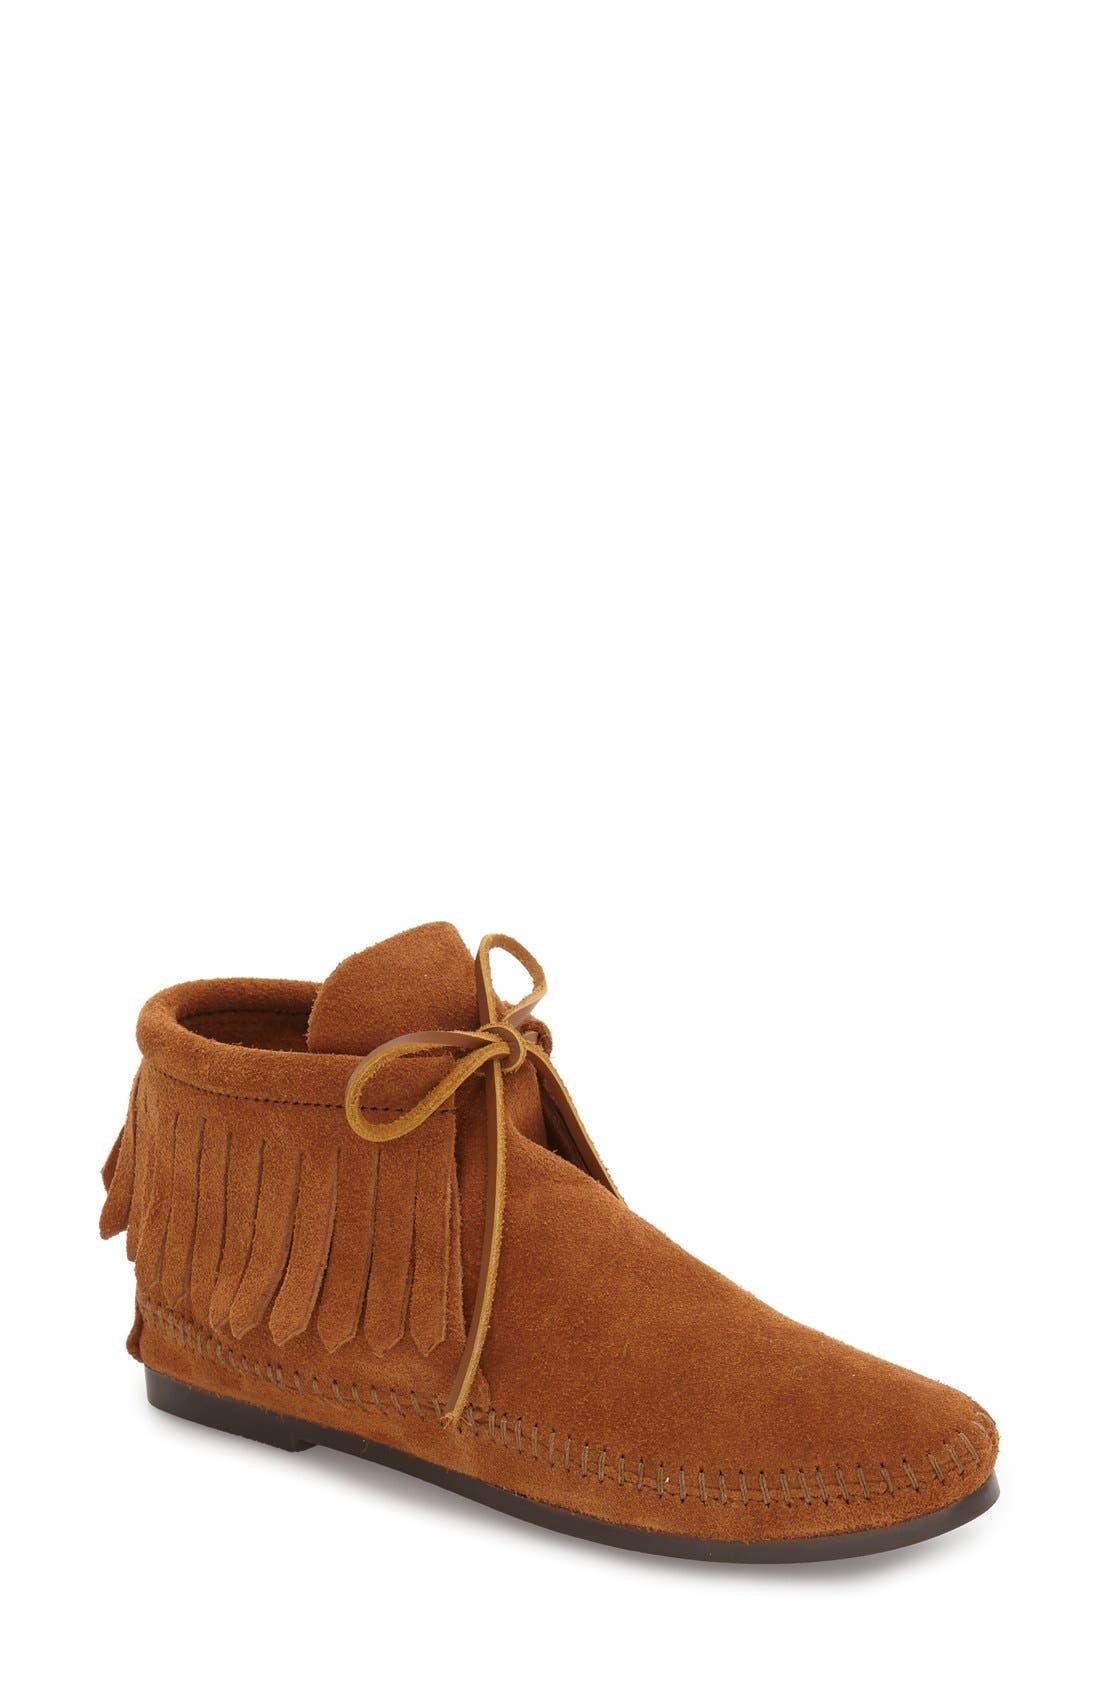 Main Image - Minnetonka Classic Fringed Chukka Style Boot (Women)